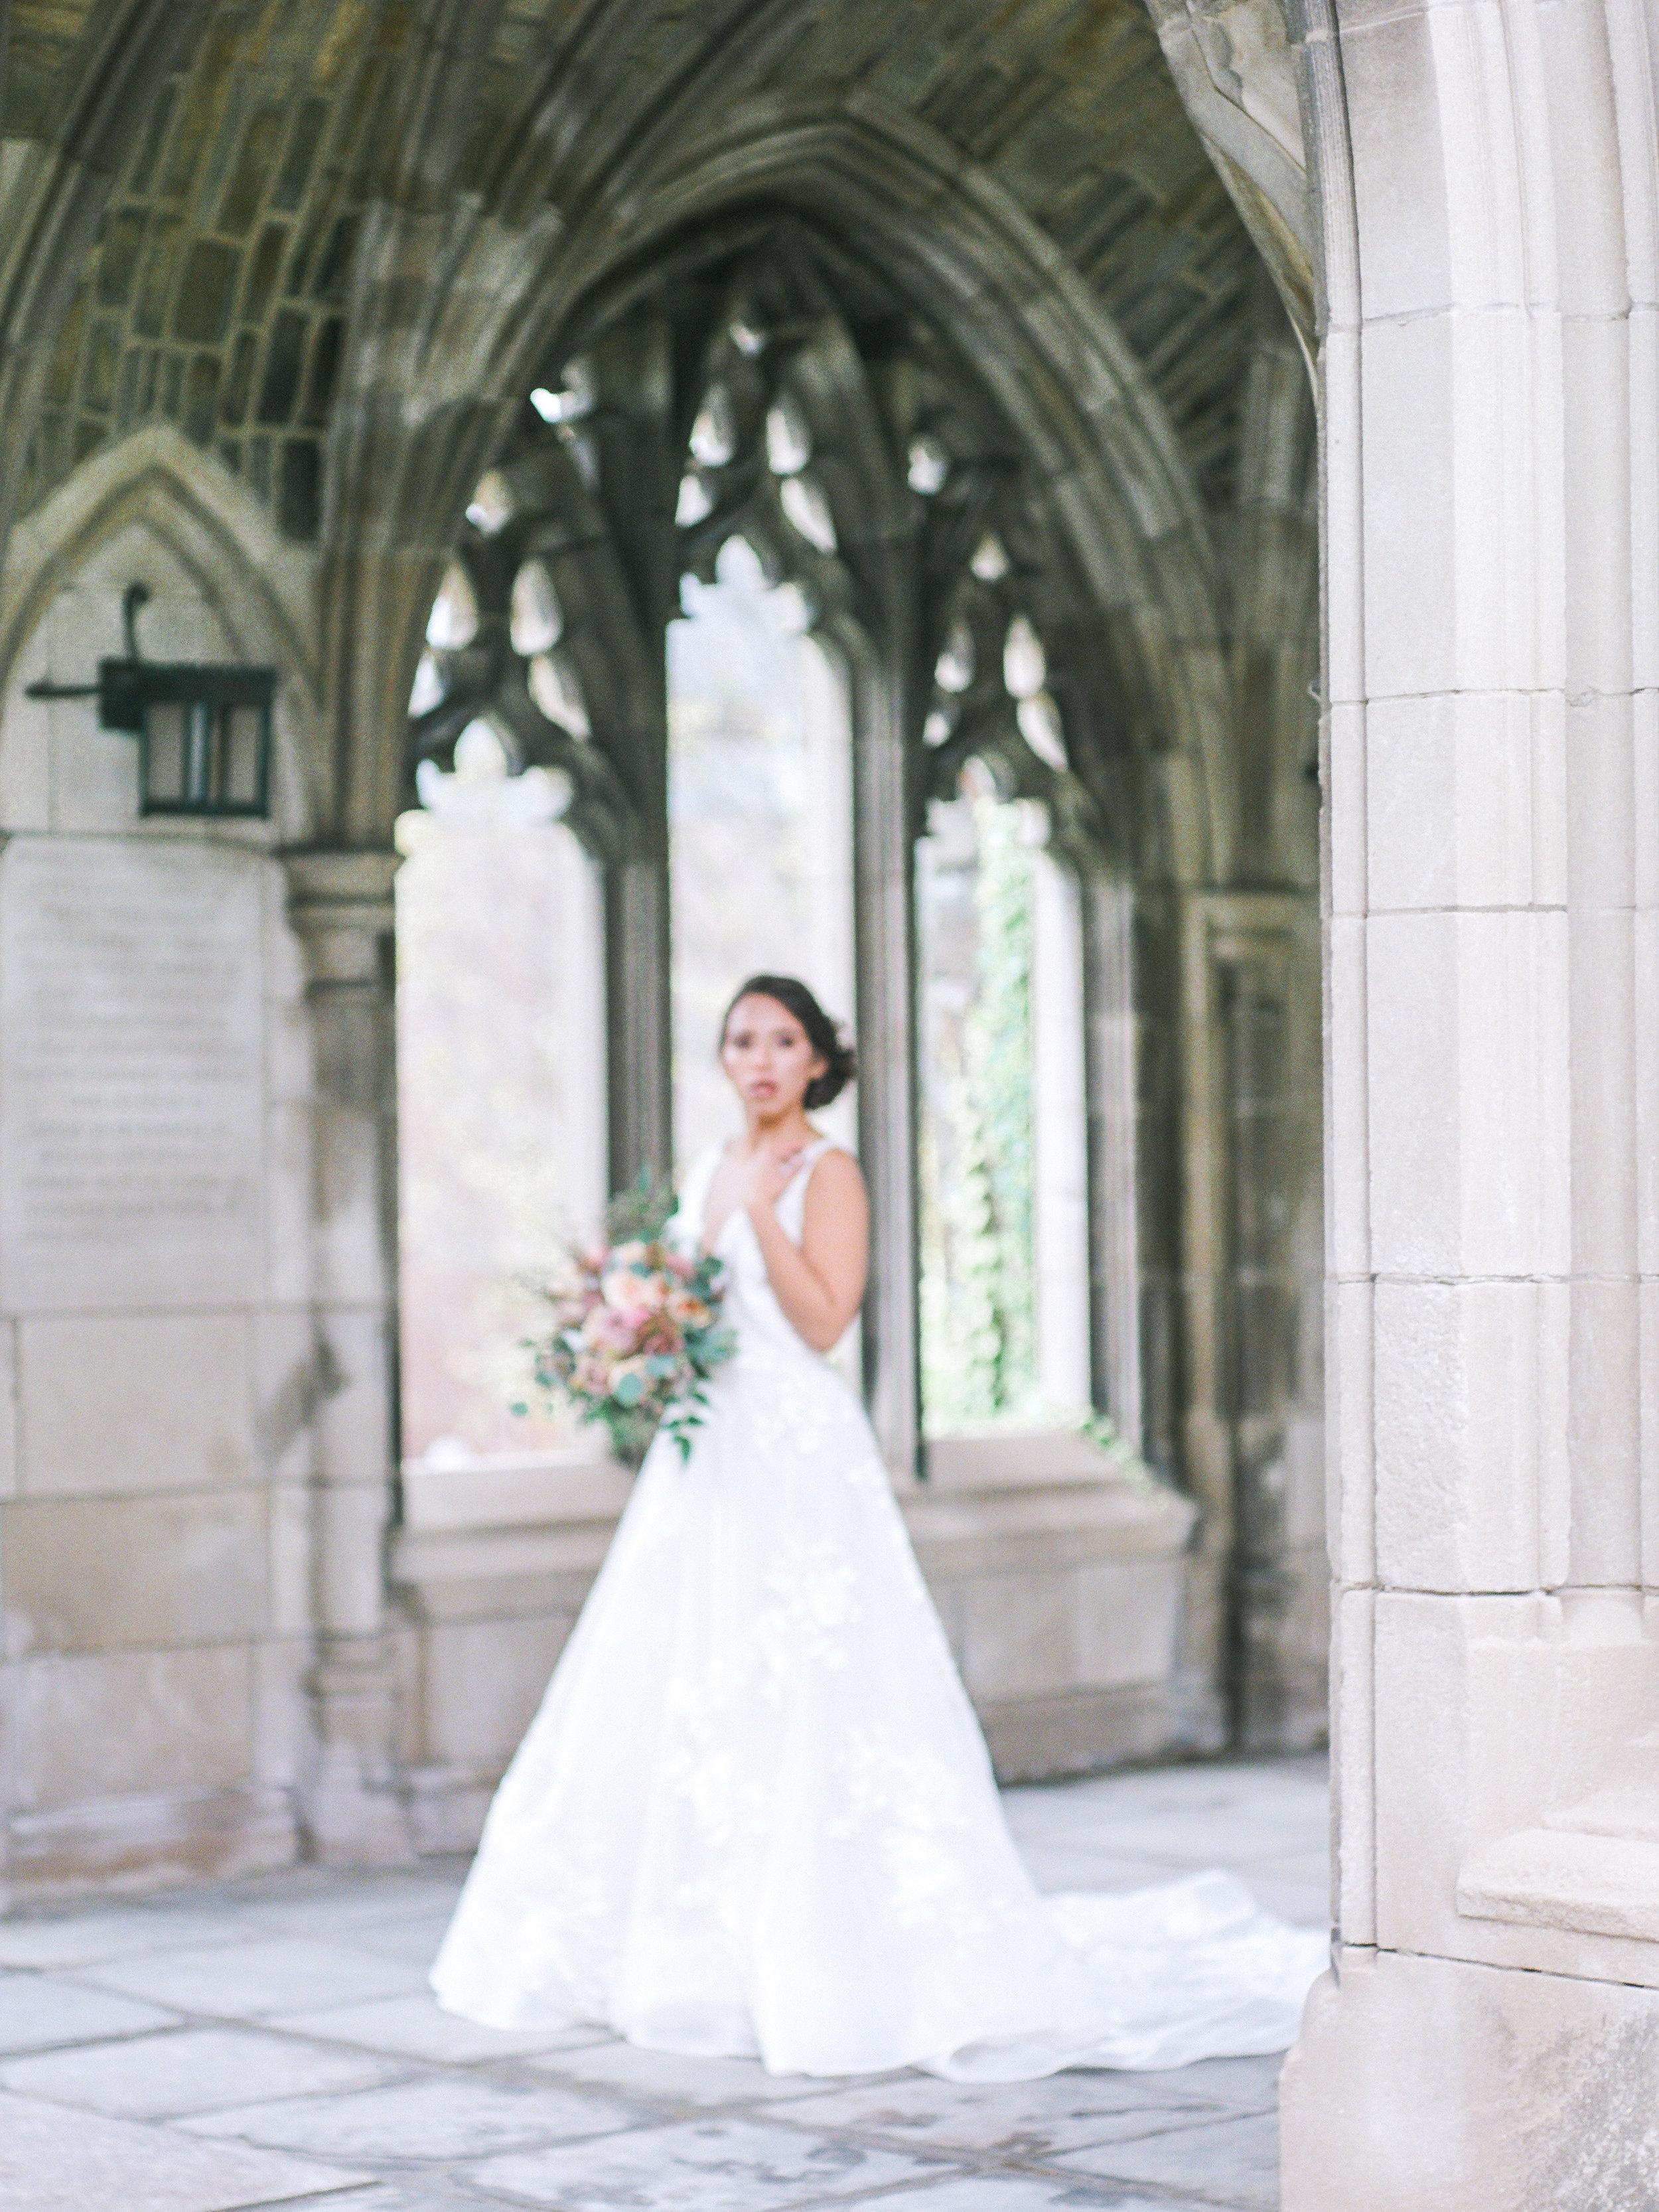 Ithaca New York-Brides Story-Manda Weaver-Wedding-21.jpg